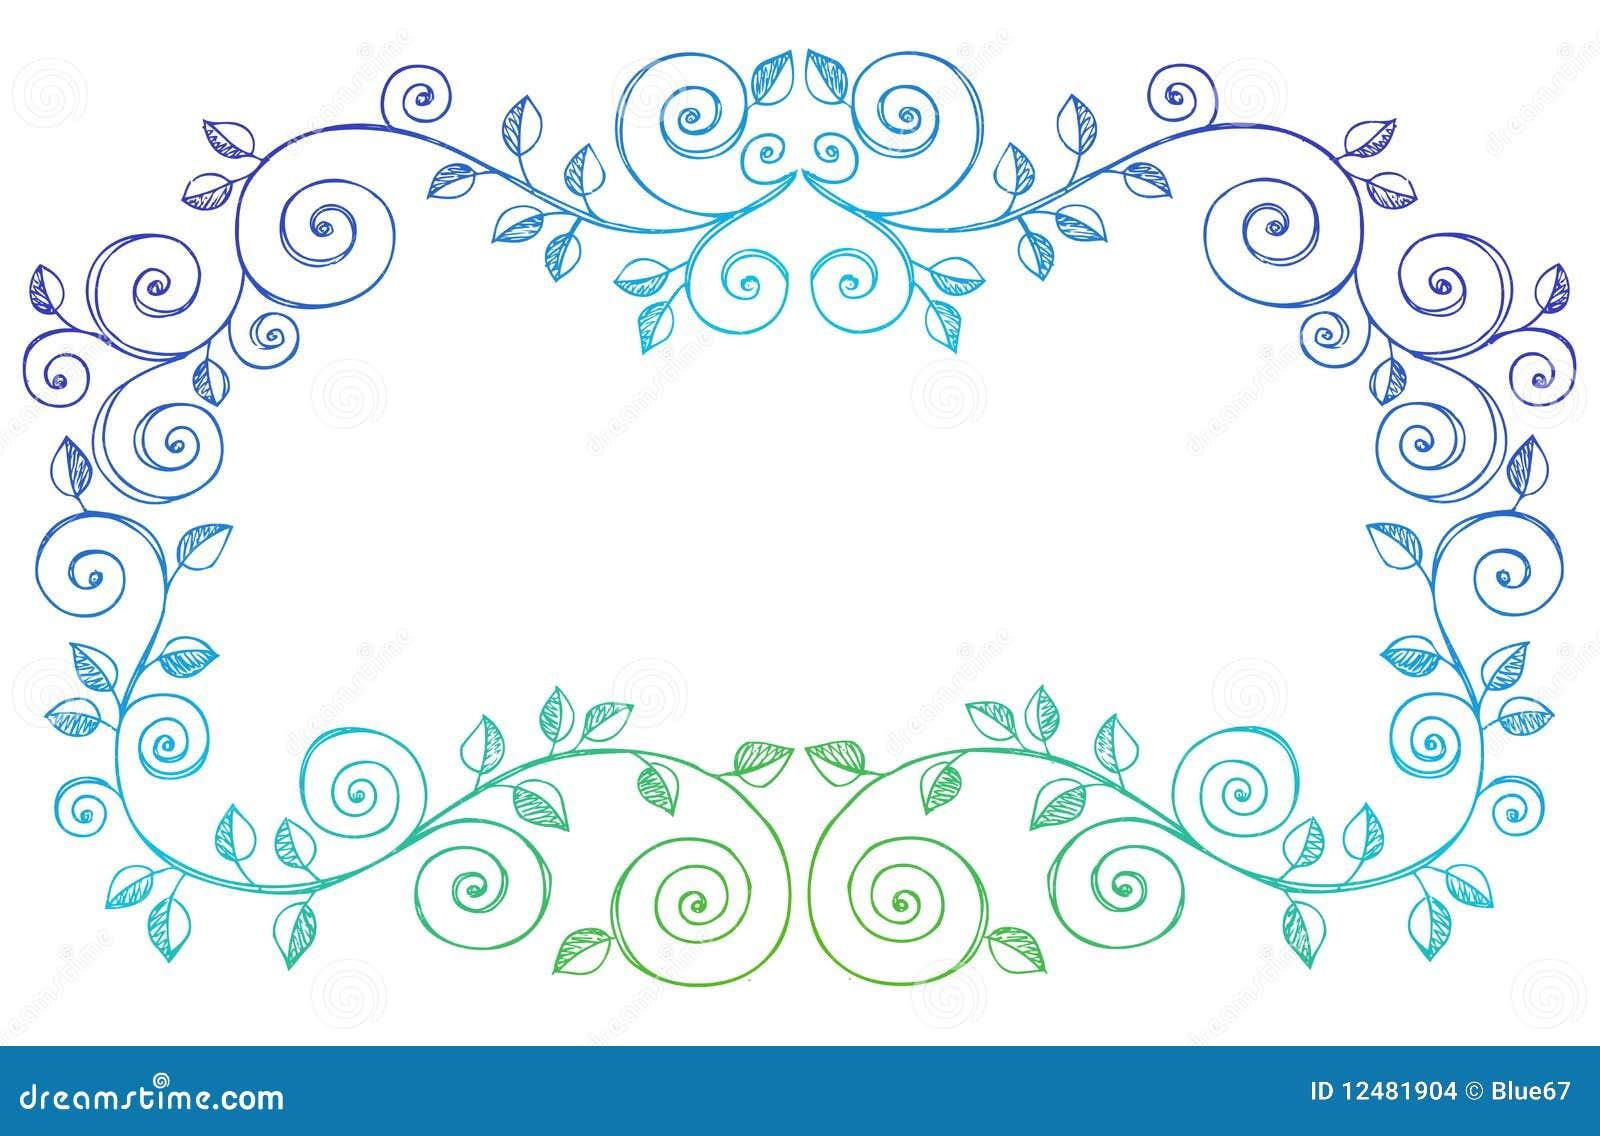 Sketchy Notebook Doodles Swirls Vines Border Stock Images - Image ...